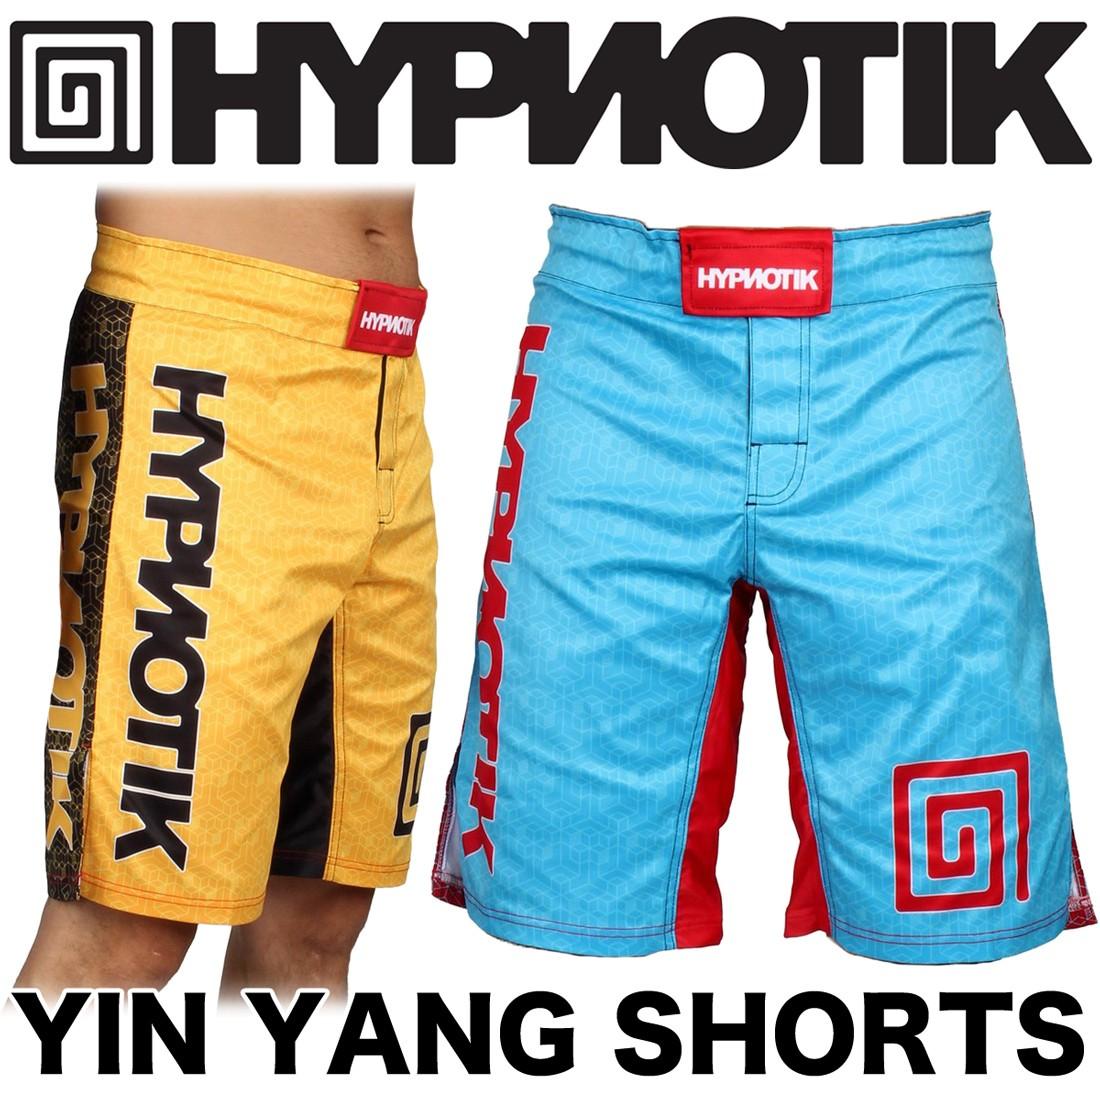 HYPNOTIK YIN YANG SHORTS